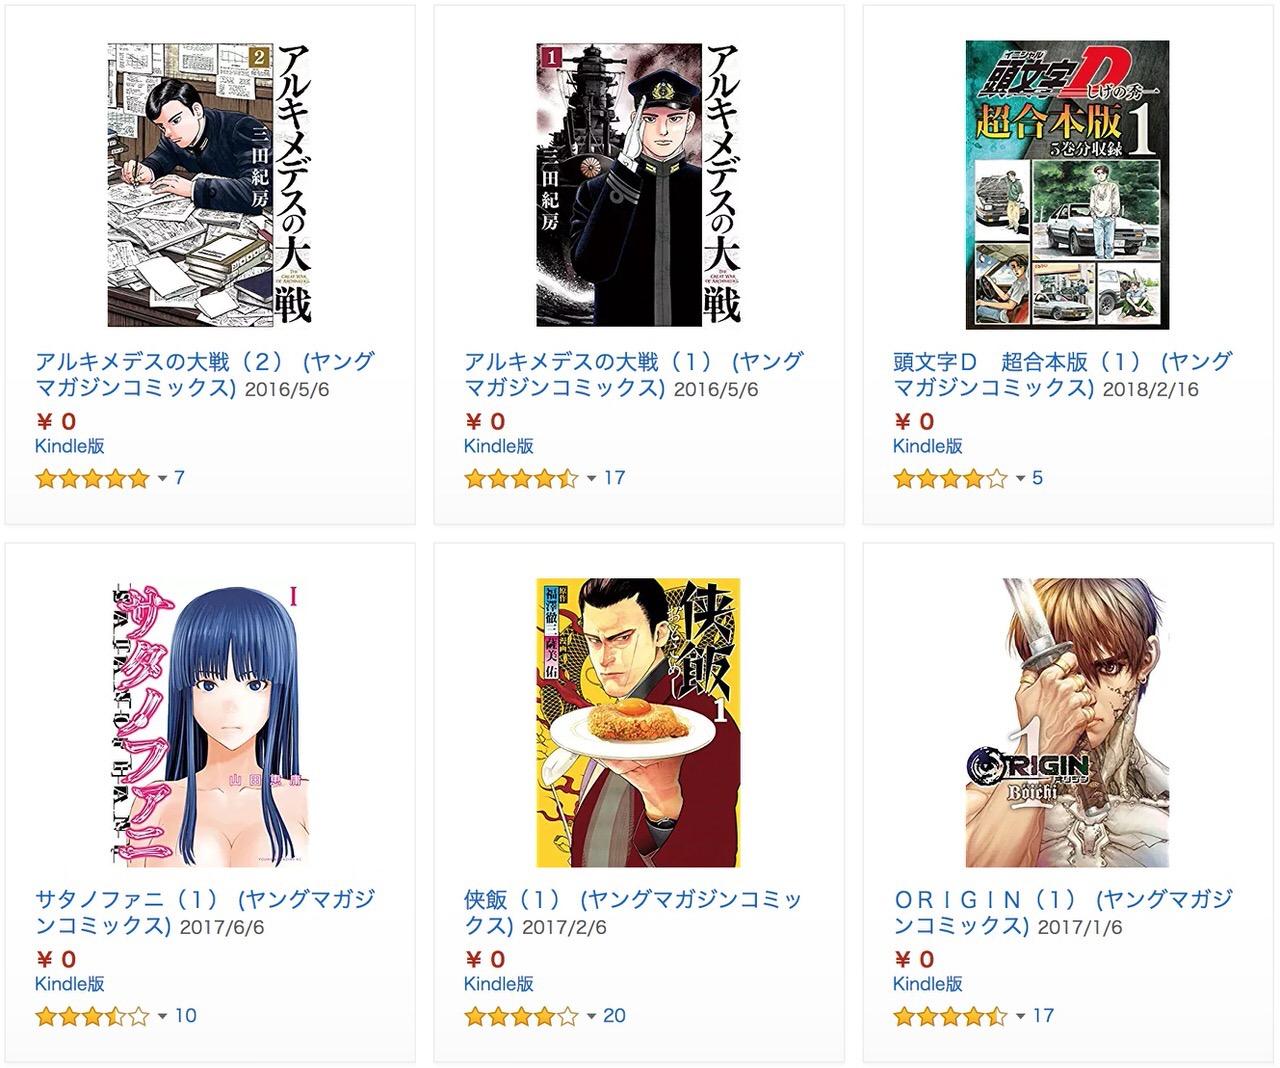 【Kindleセール】期間限定無料「夏☆電書」なんでも揃うヤングマガジン特集(8/16まで)